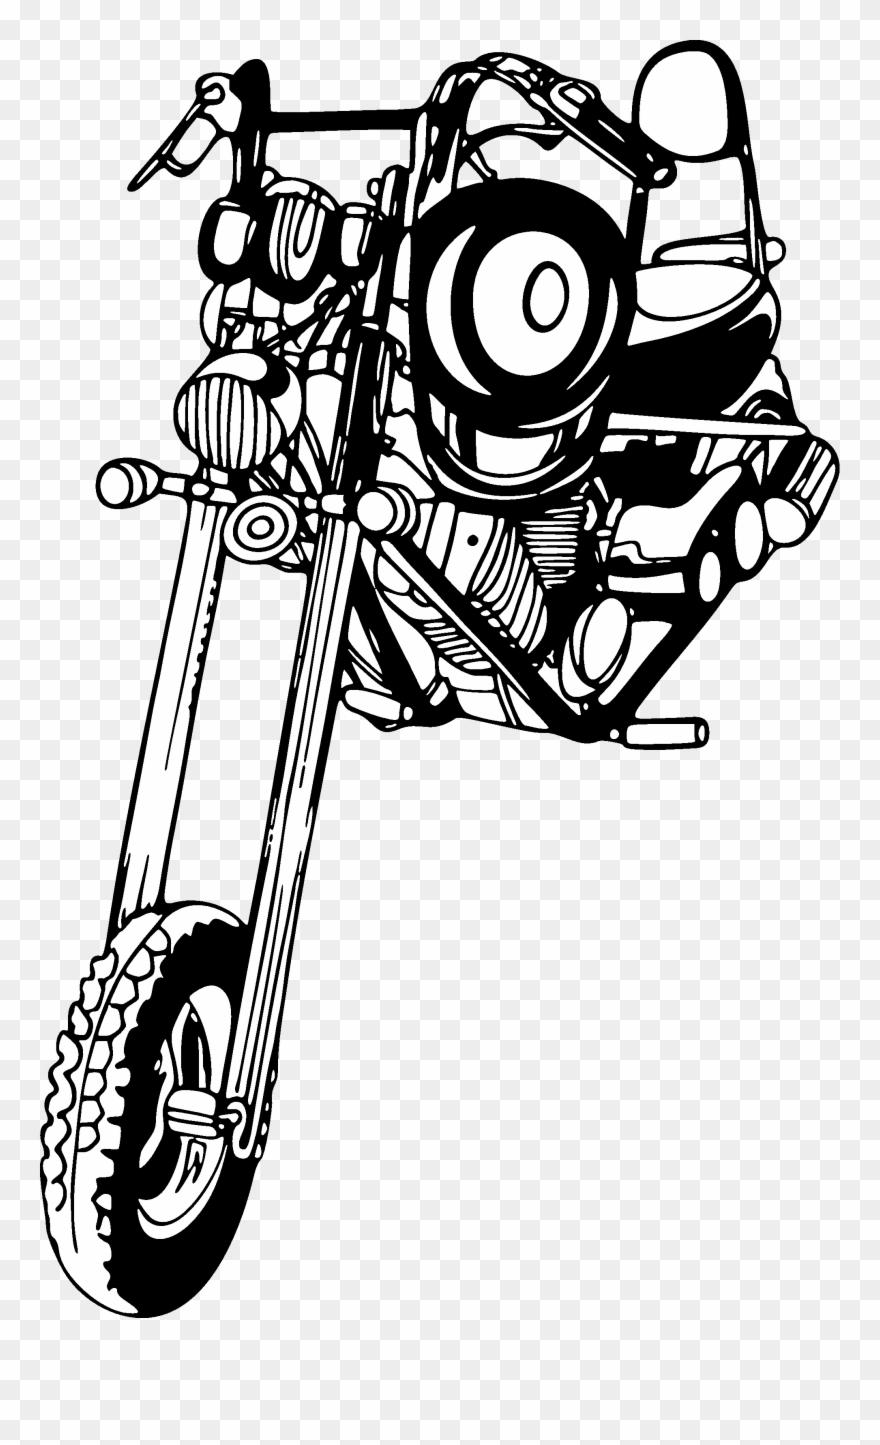 Chopper easy rider sticker clipart